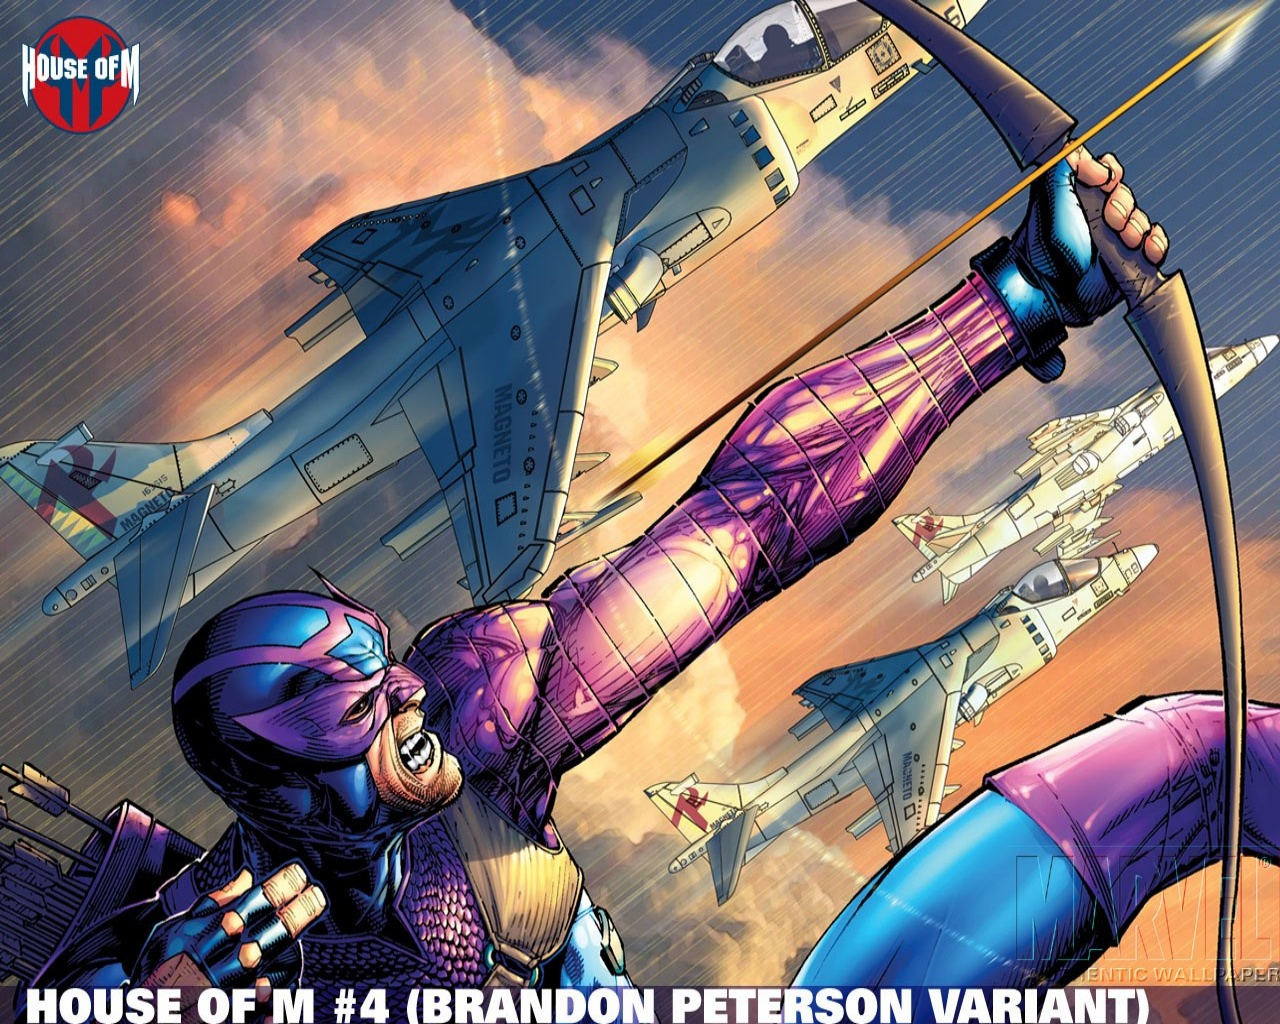 Hawkeye 4   Comics Photography Desktop Wallpapers 2217 Views 1280x1024